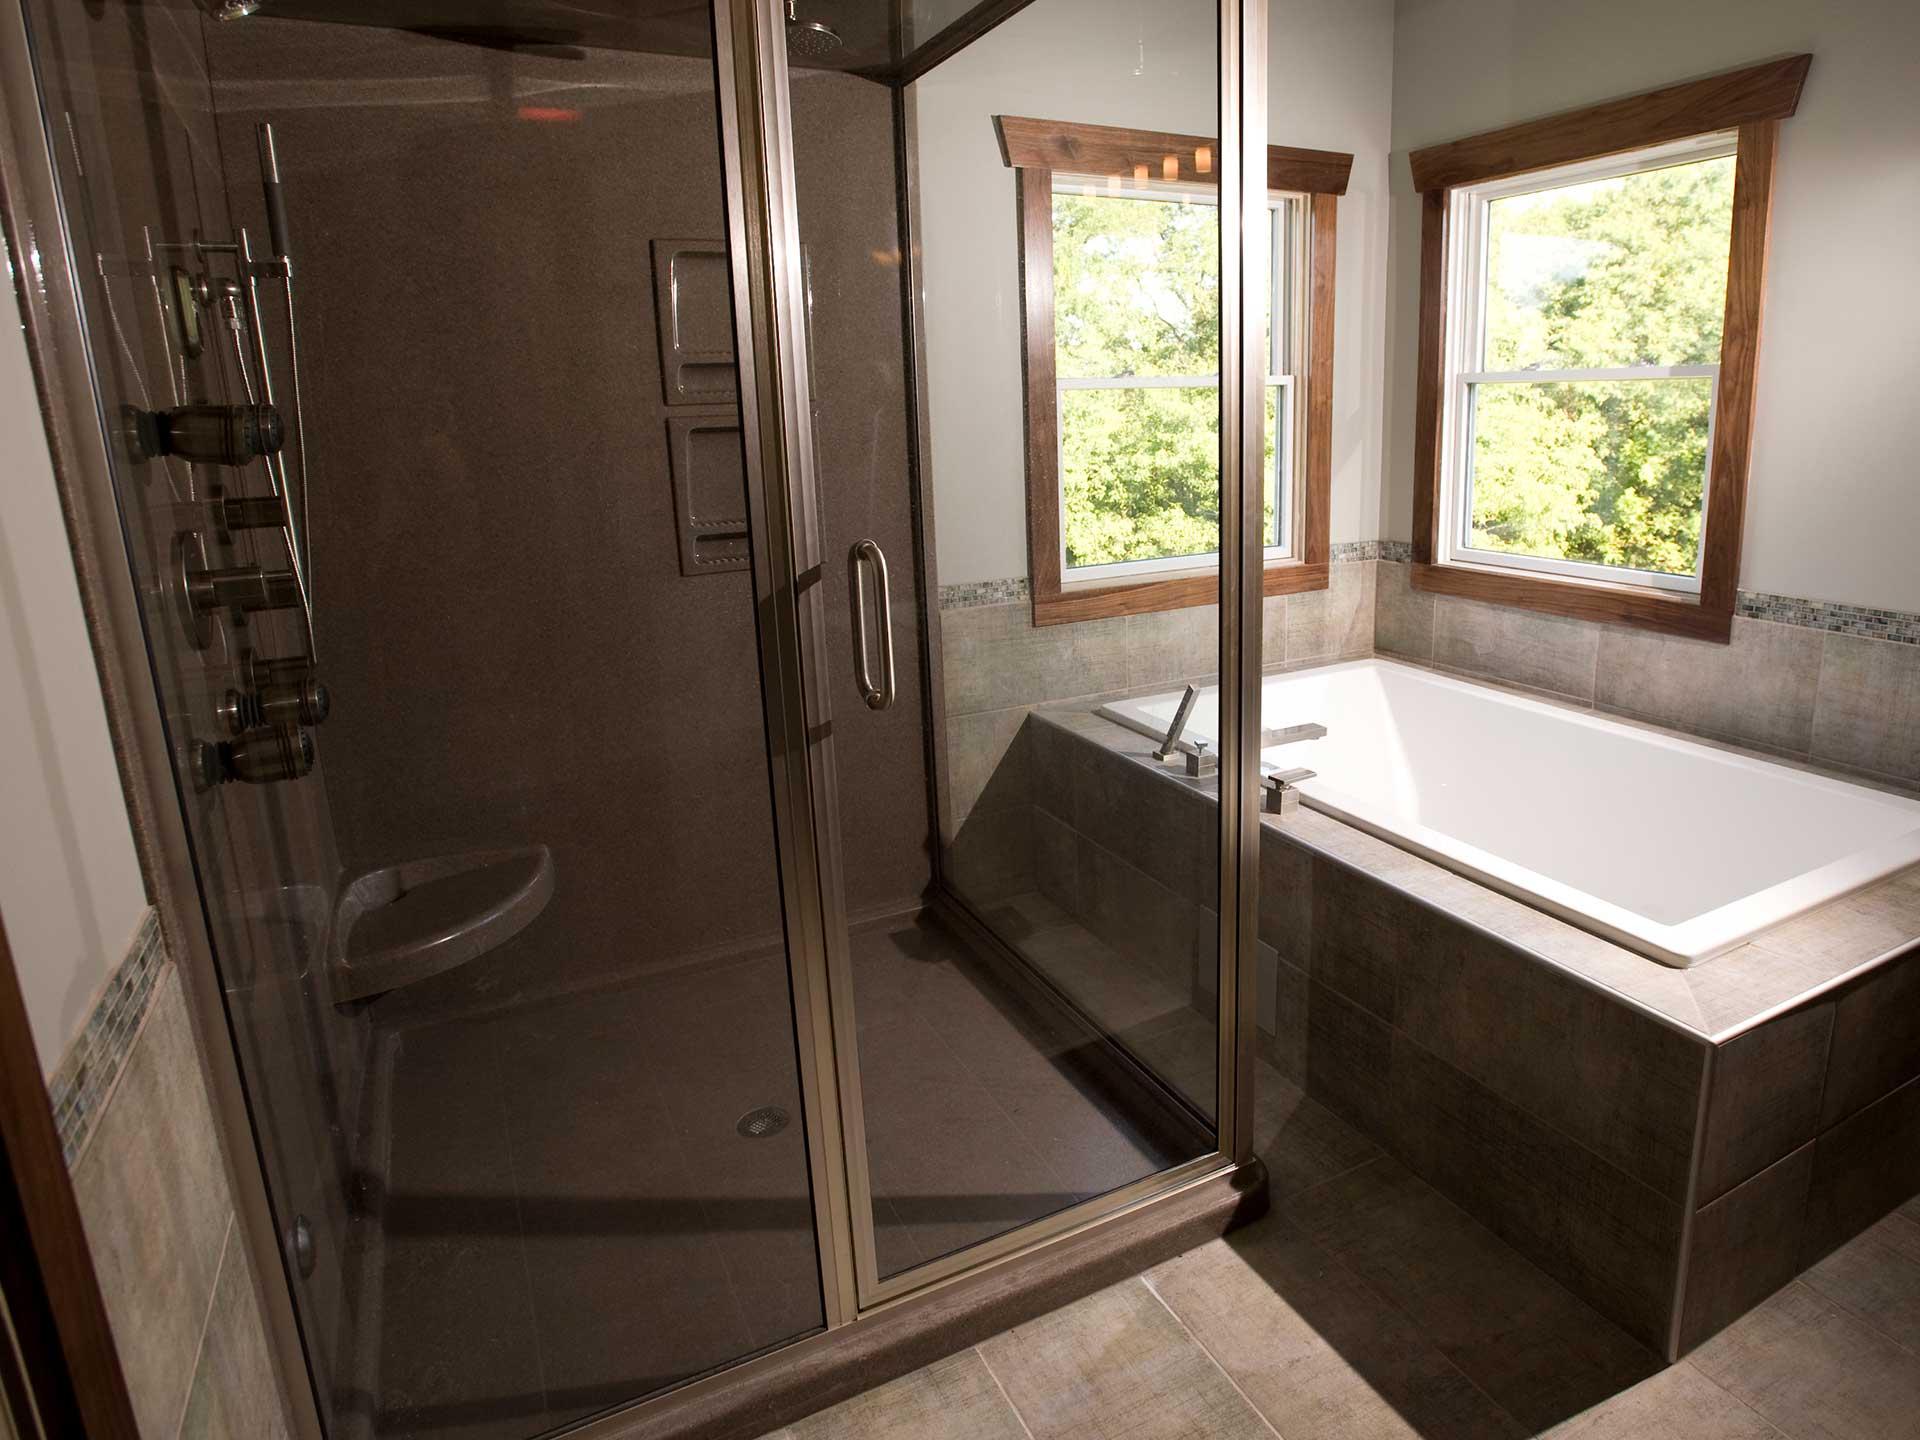 midwest-remodeling-bathroom-remodel-3